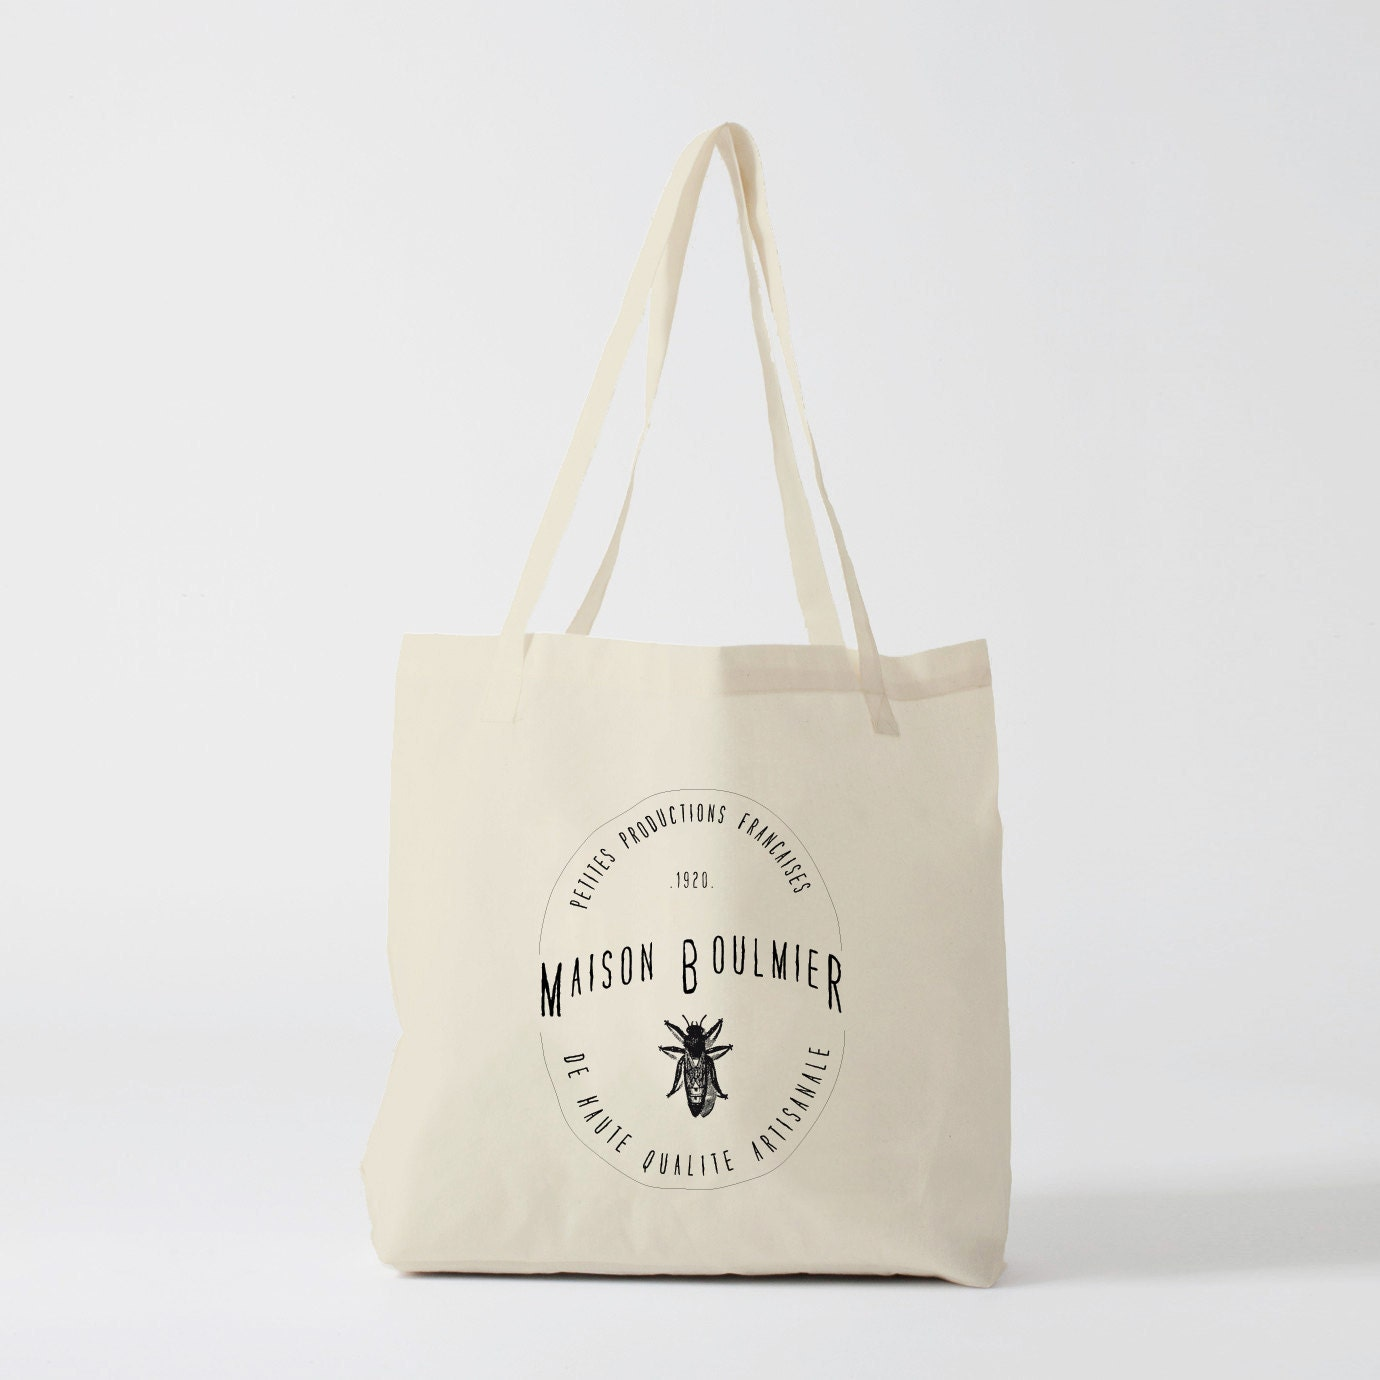 tote bag maison boulmier sac en toile sac coton sac. Black Bedroom Furniture Sets. Home Design Ideas